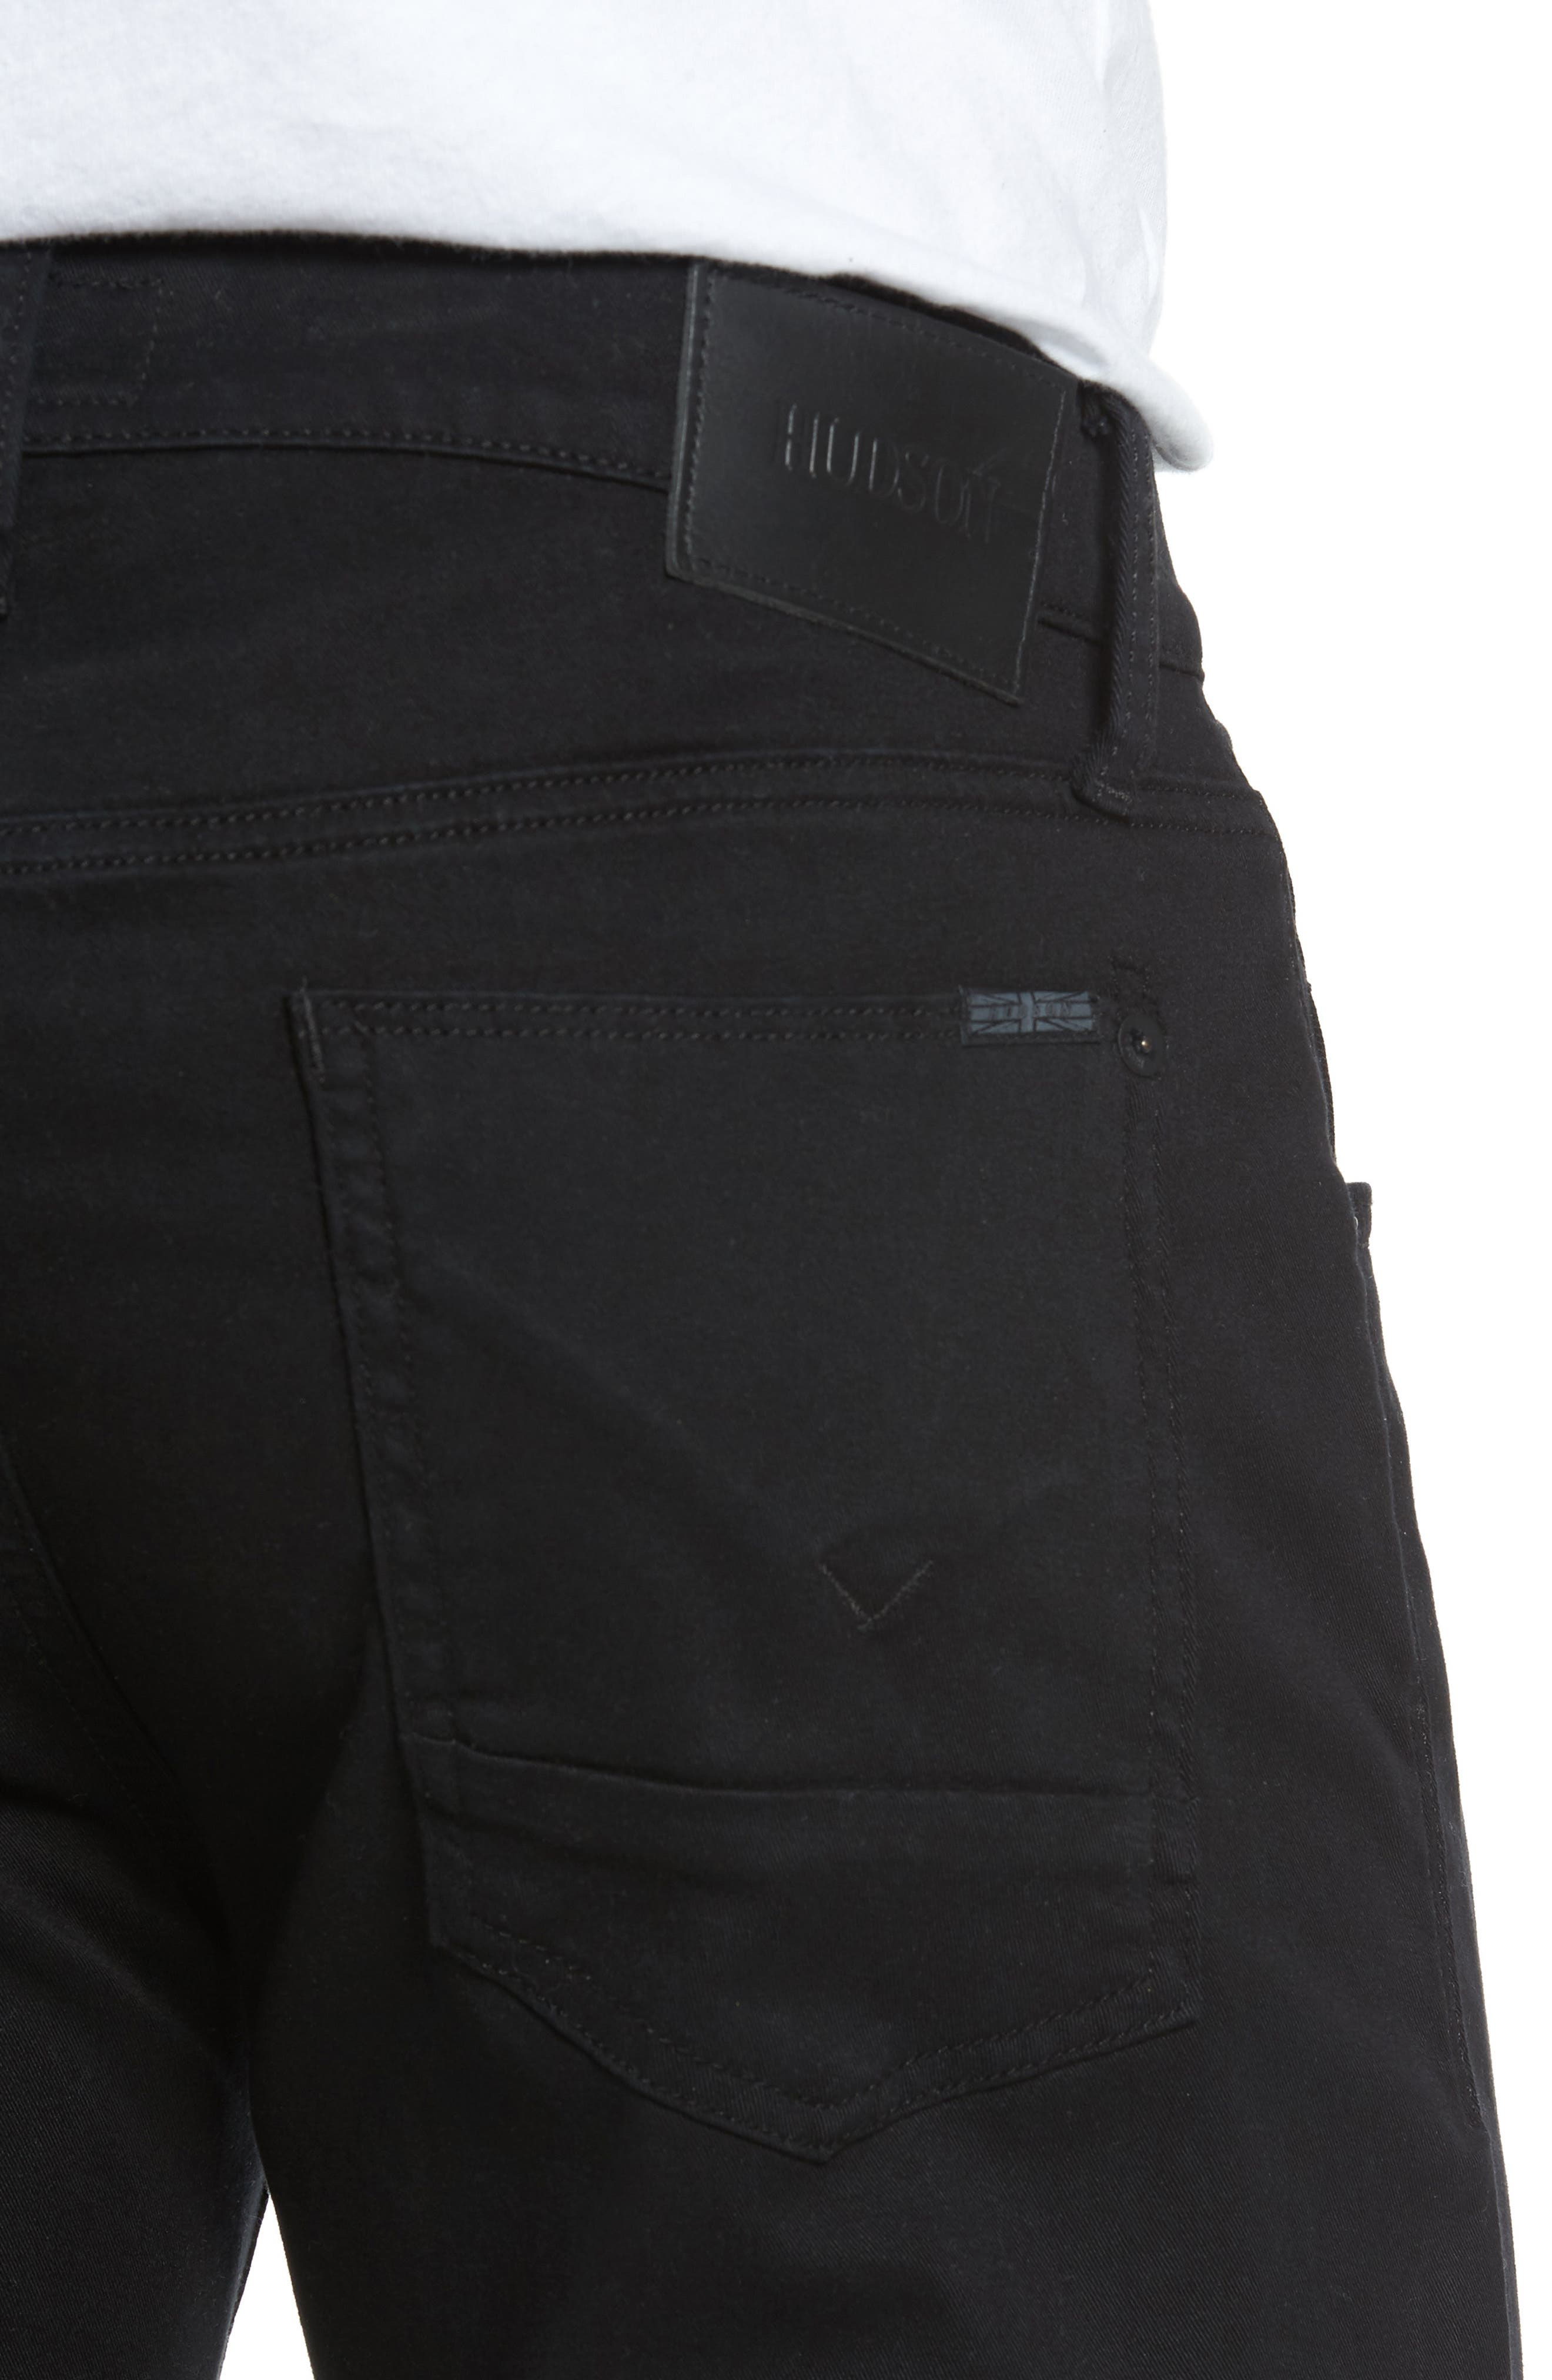 Blake Slim Fit Jeans,                             Alternate thumbnail 4, color,                             Blackened